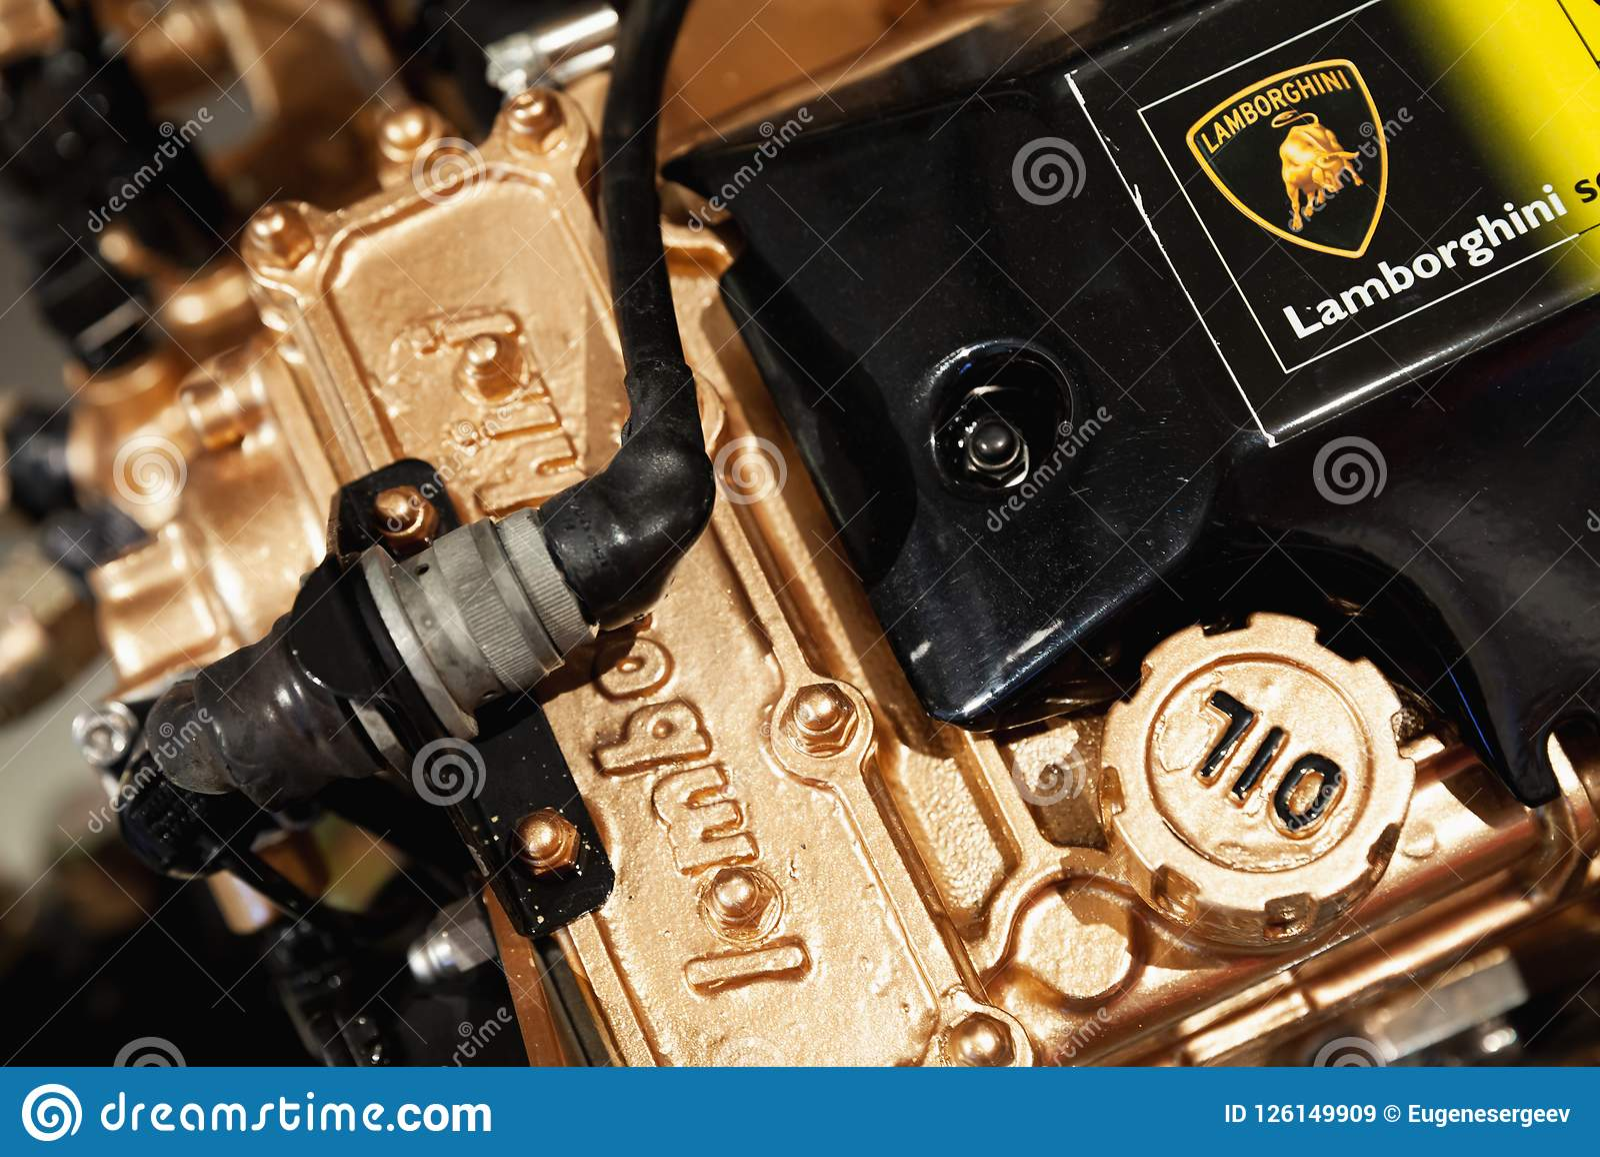 Lamborghini V12 Fast Boat Engine Fragment Editorial Stock